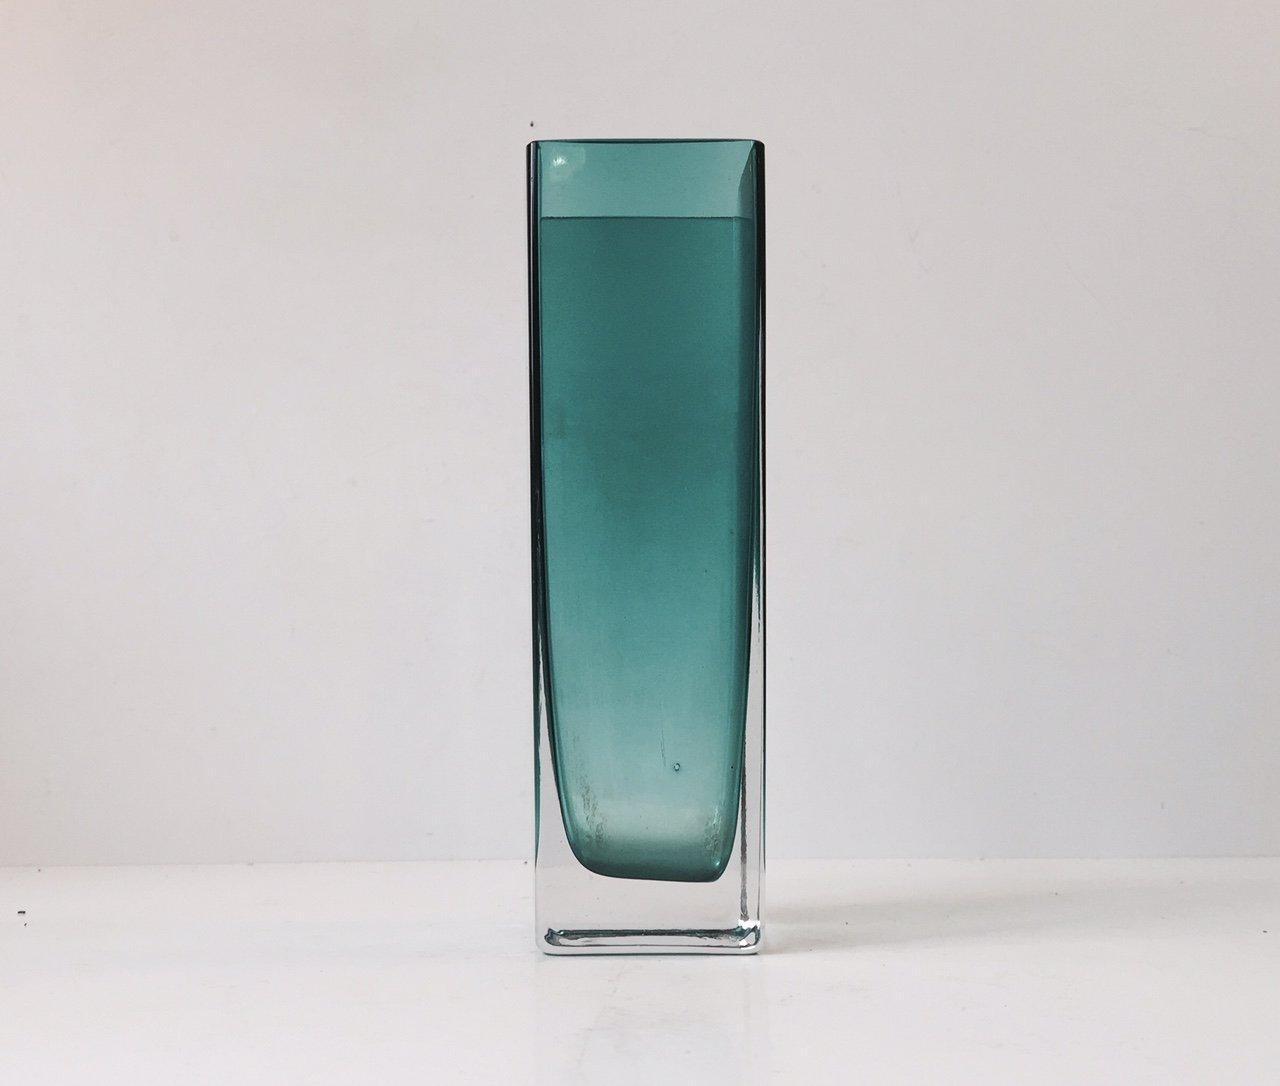 Turquoise rectangular glass vase by gunnar ander for lindshammar turquoise rectangular glass vase by gunnar ander for lindshammar reviewsmspy